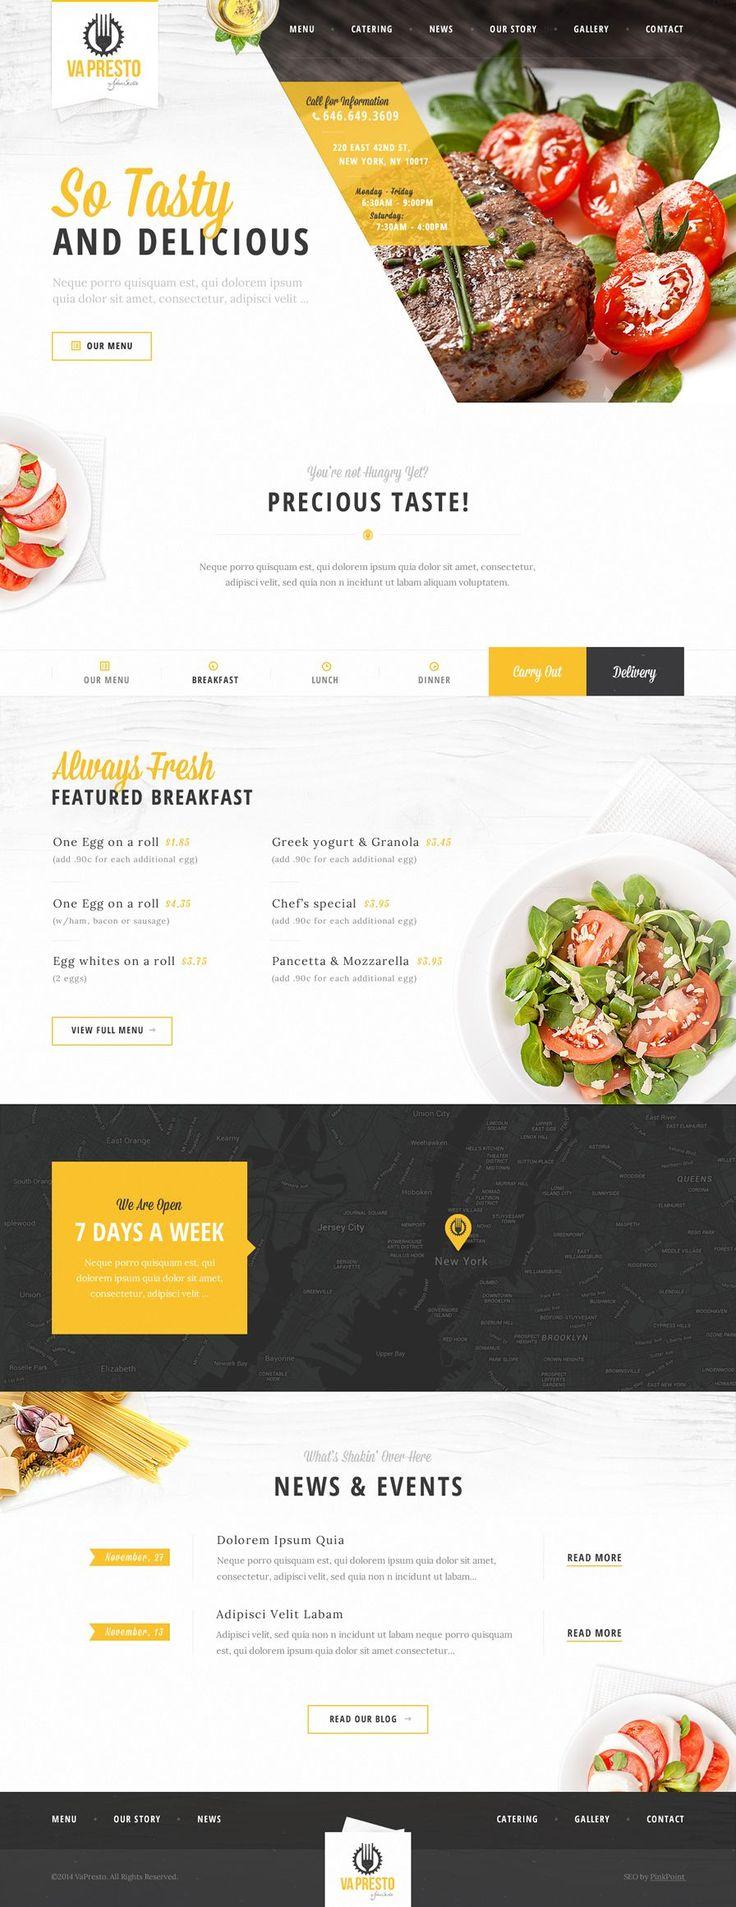 restaurant website idea. #webdesign #inspiration